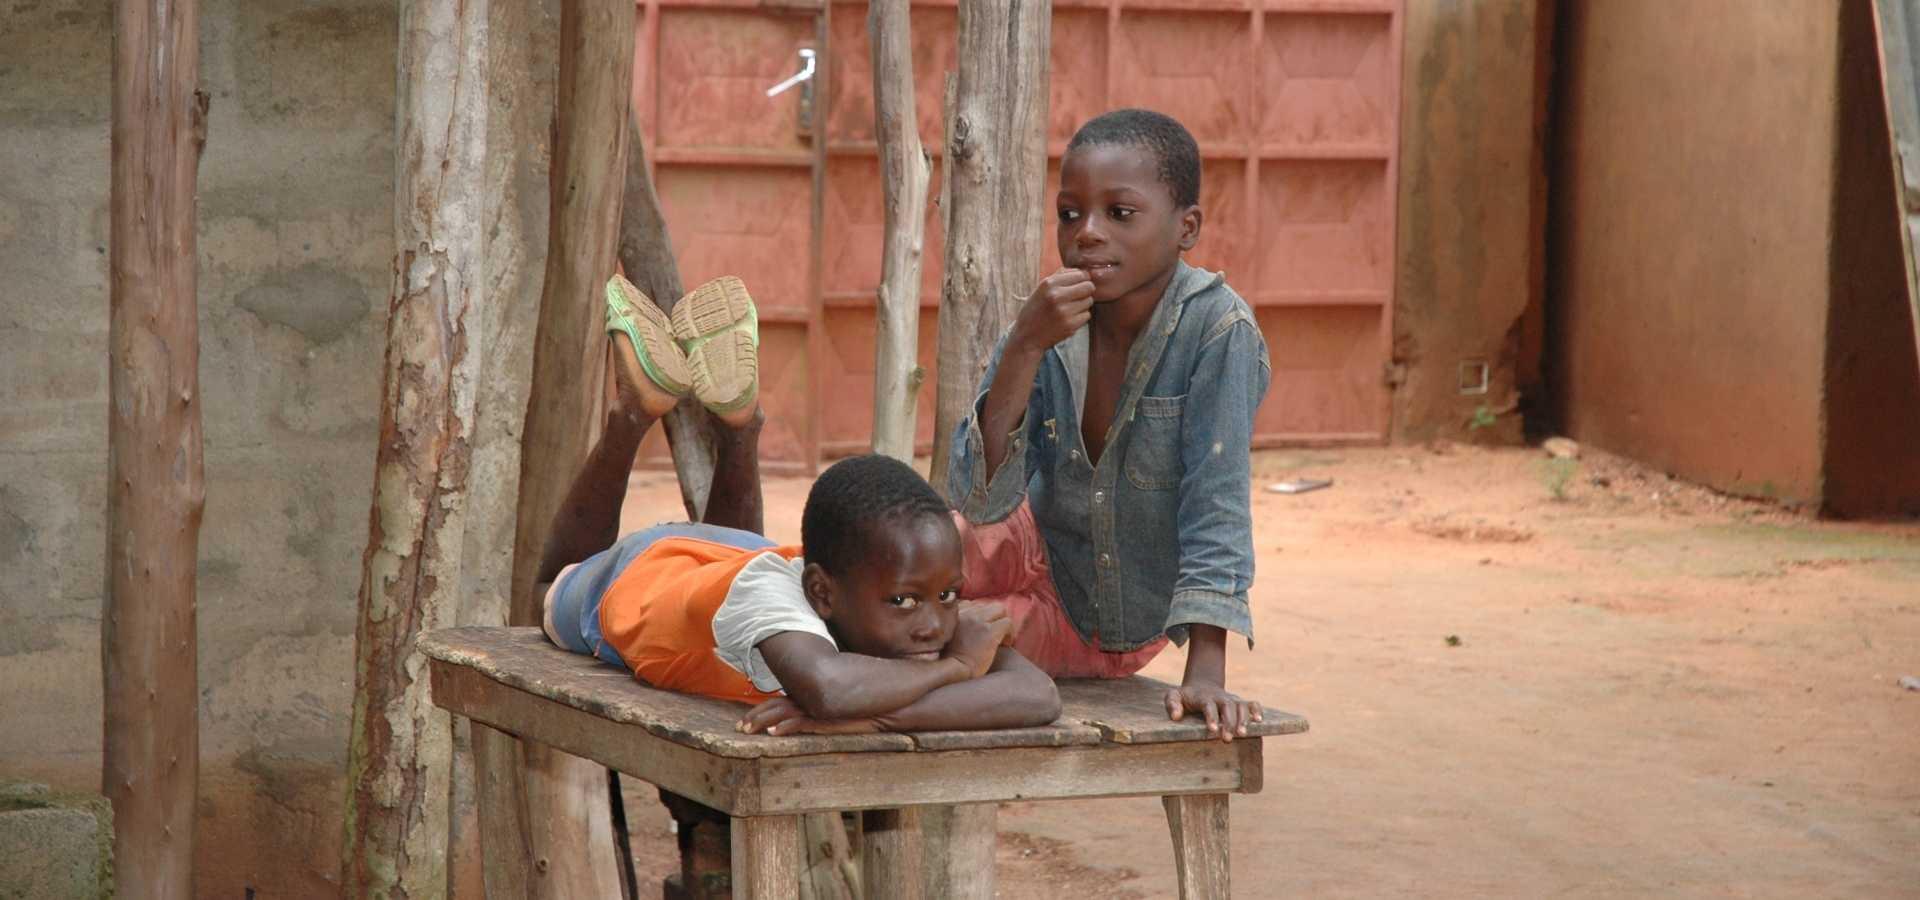 GSA GRUPPO SOLIDARIETÀ AFRICA